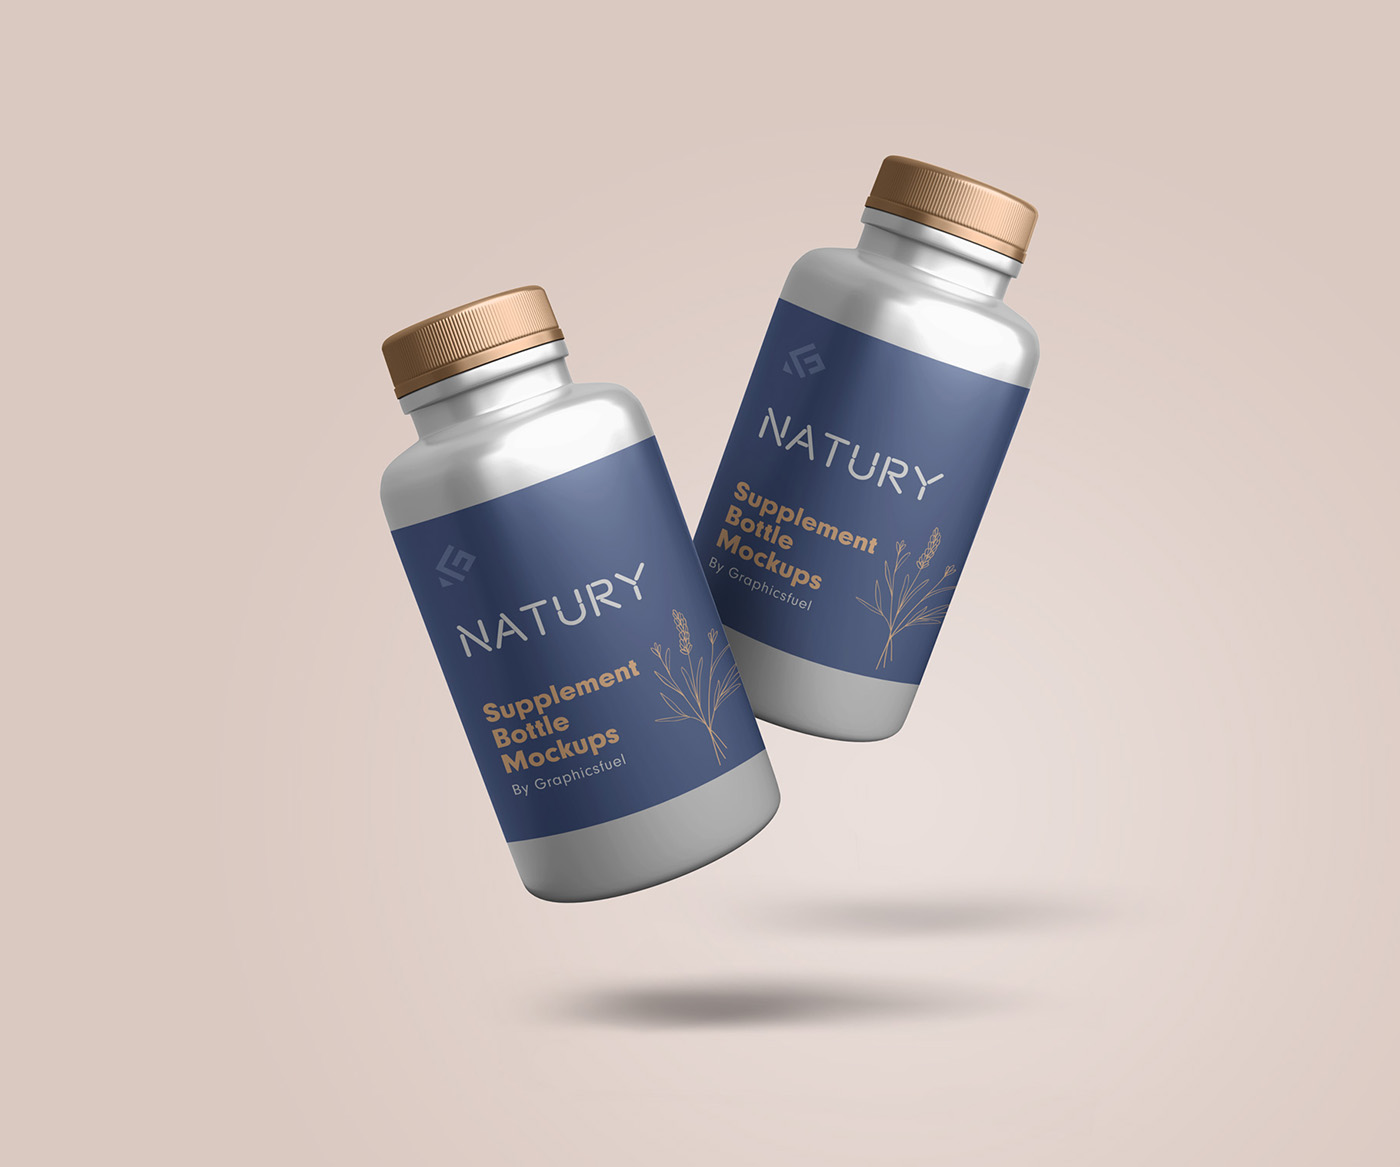 Supplement Bottle Mockup Templates